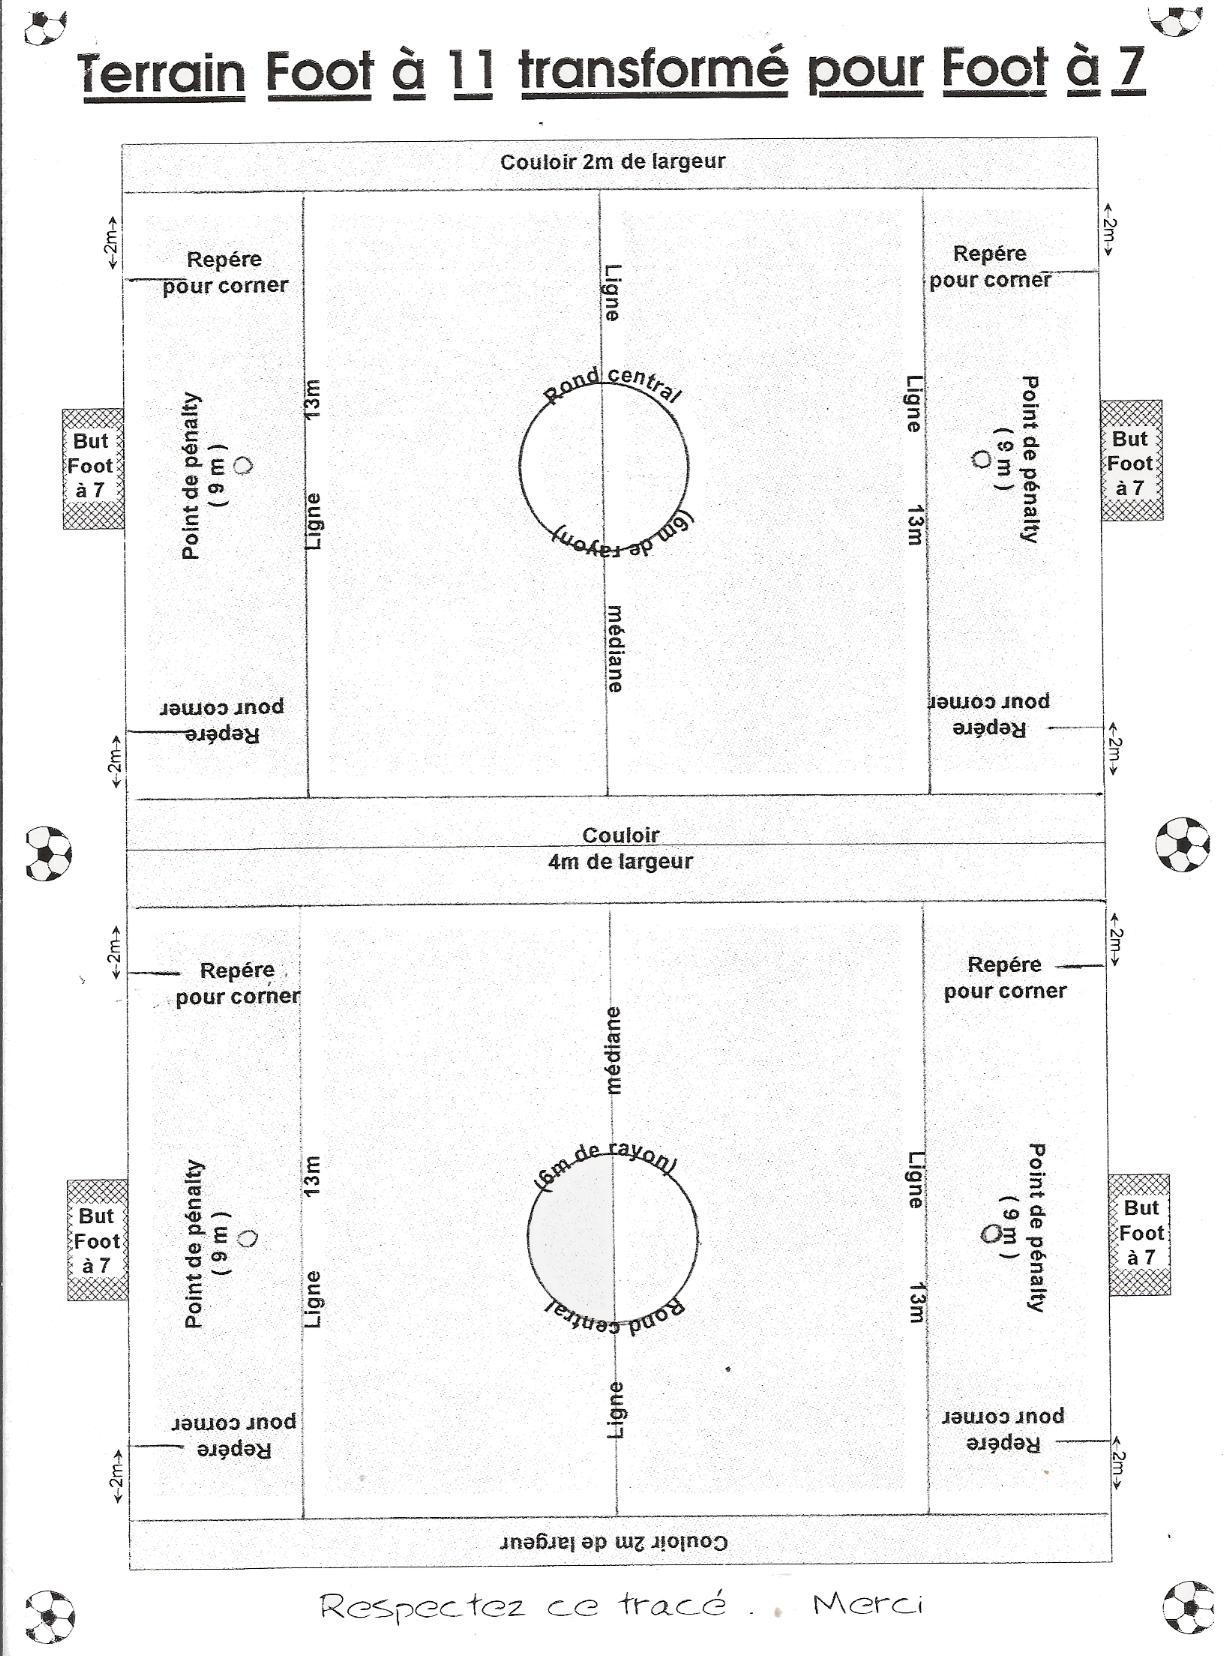 Les dimensions d un terrain de football 11 pictures to for Mesure terrain de tennis